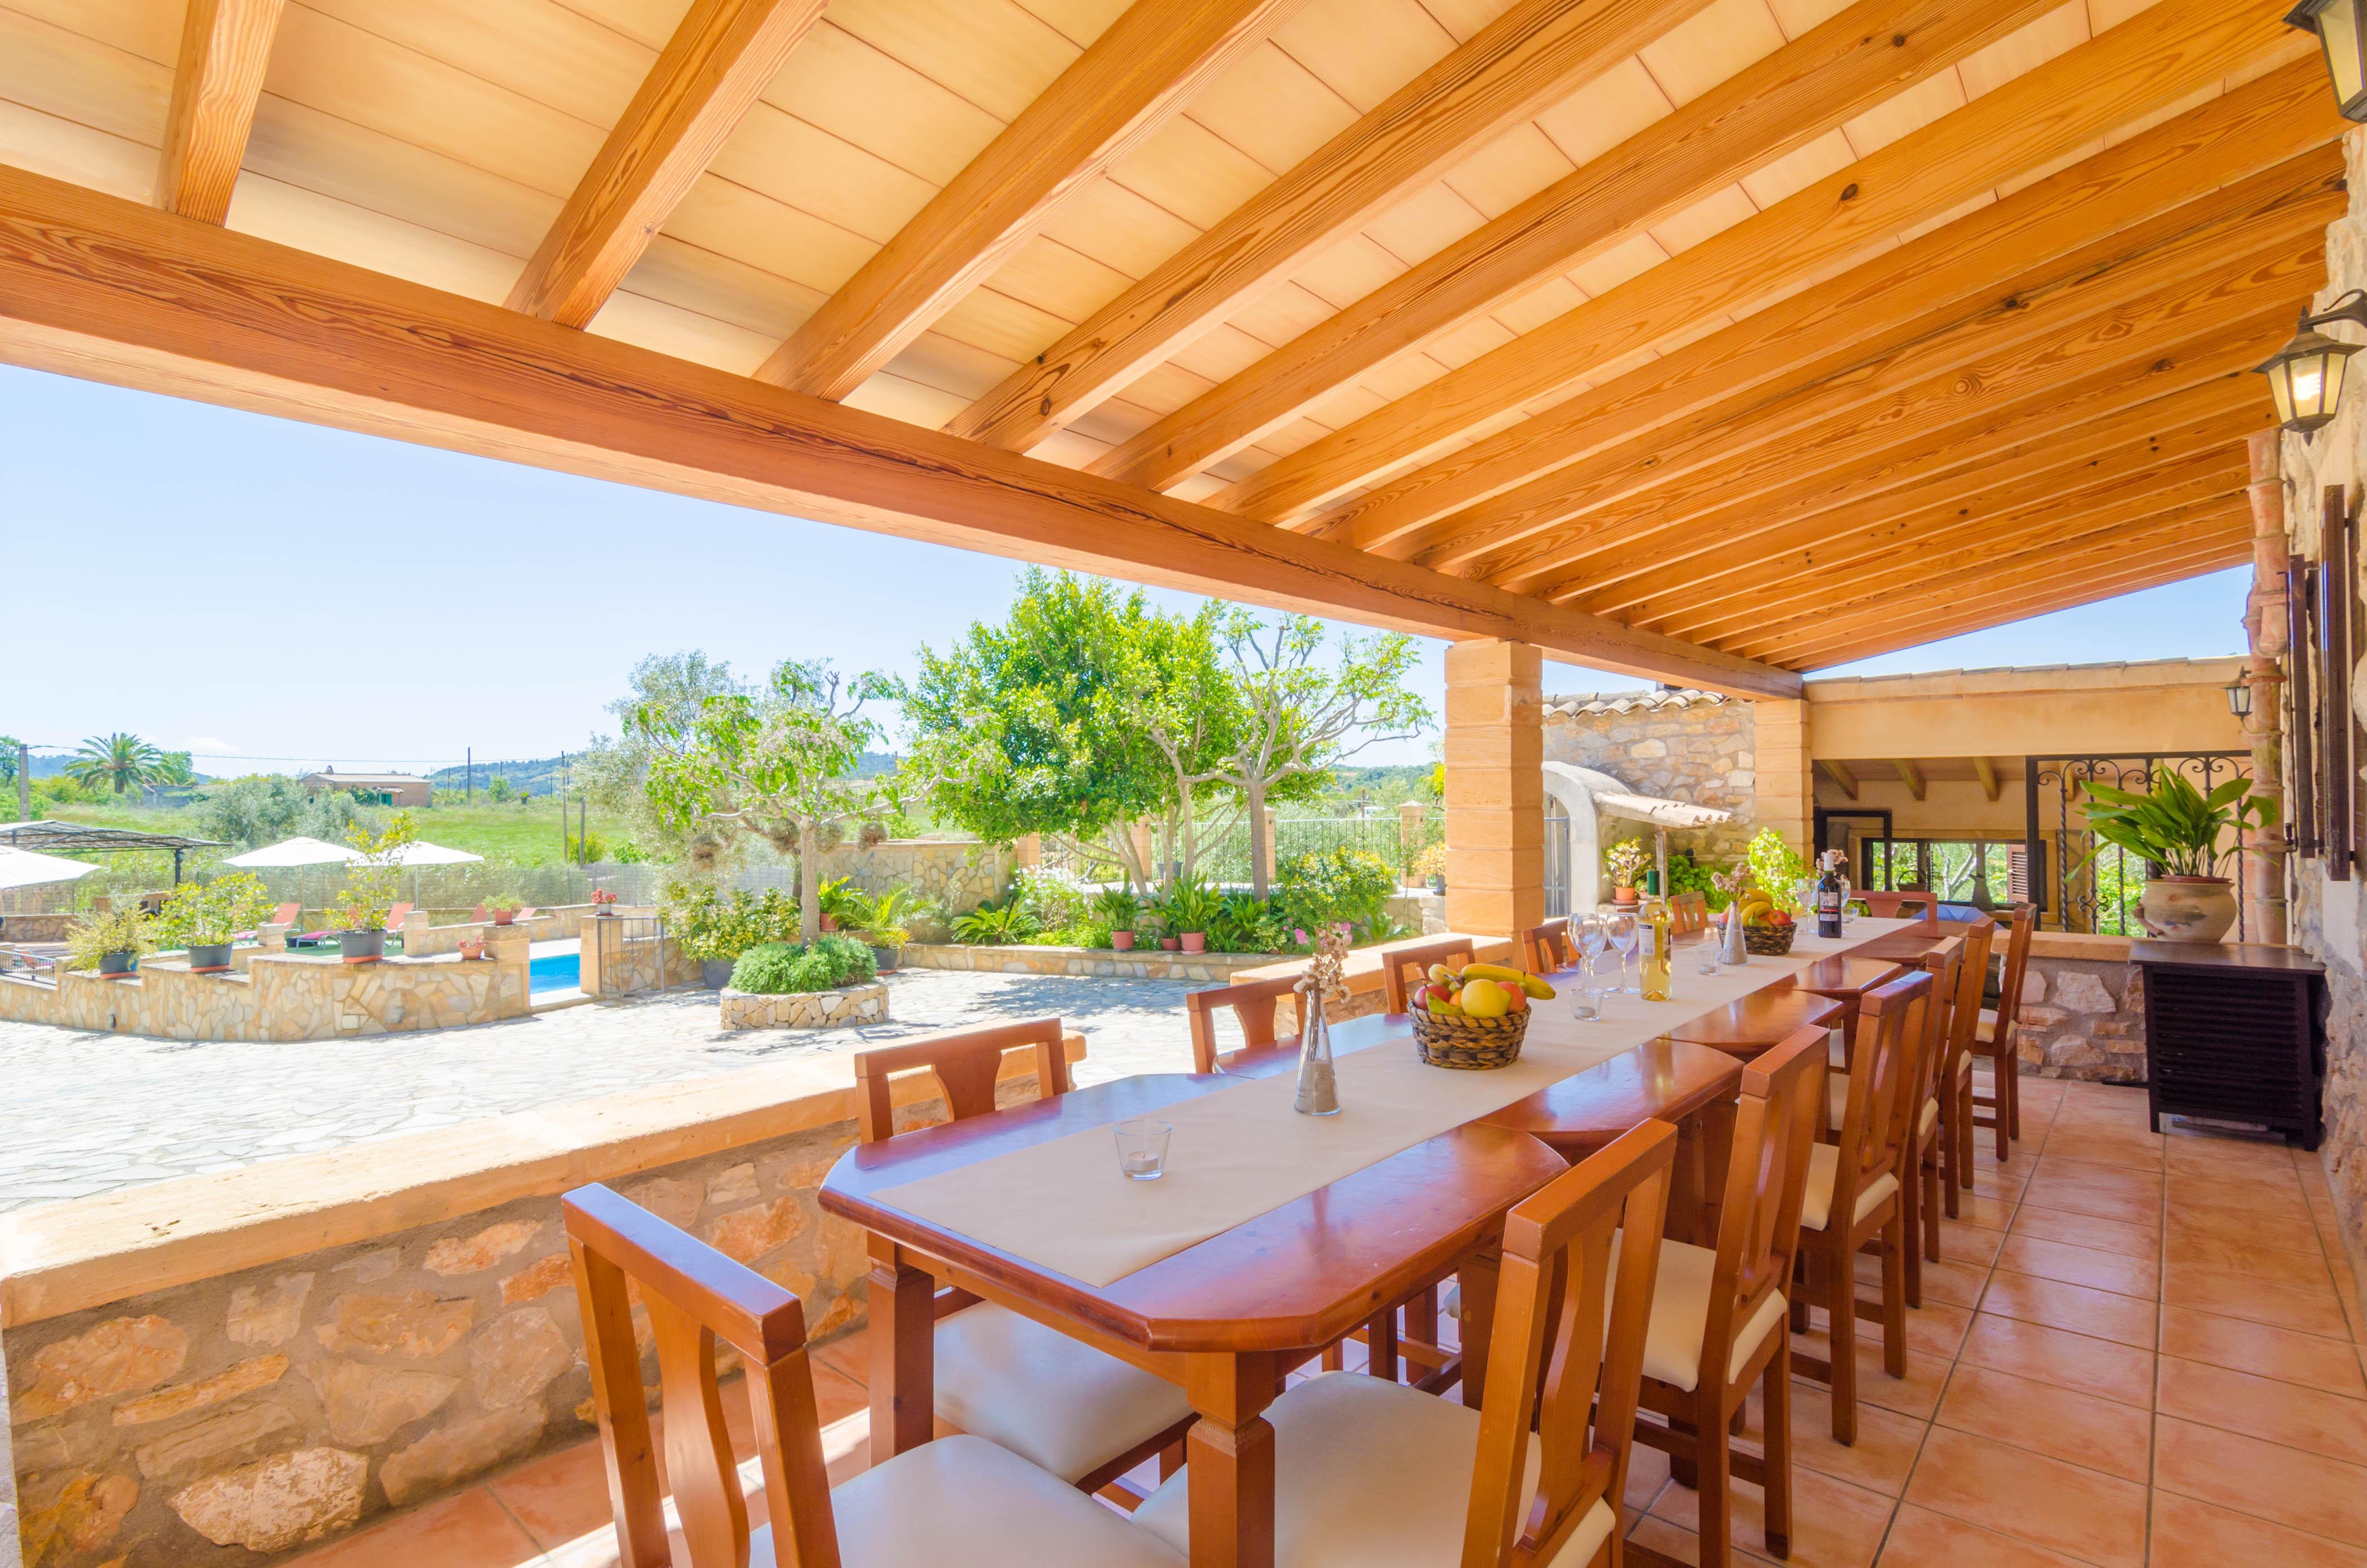 Ferienhaus SON MACIA (2186582), Son Macià, Mallorca, Balearische Inseln, Spanien, Bild 9